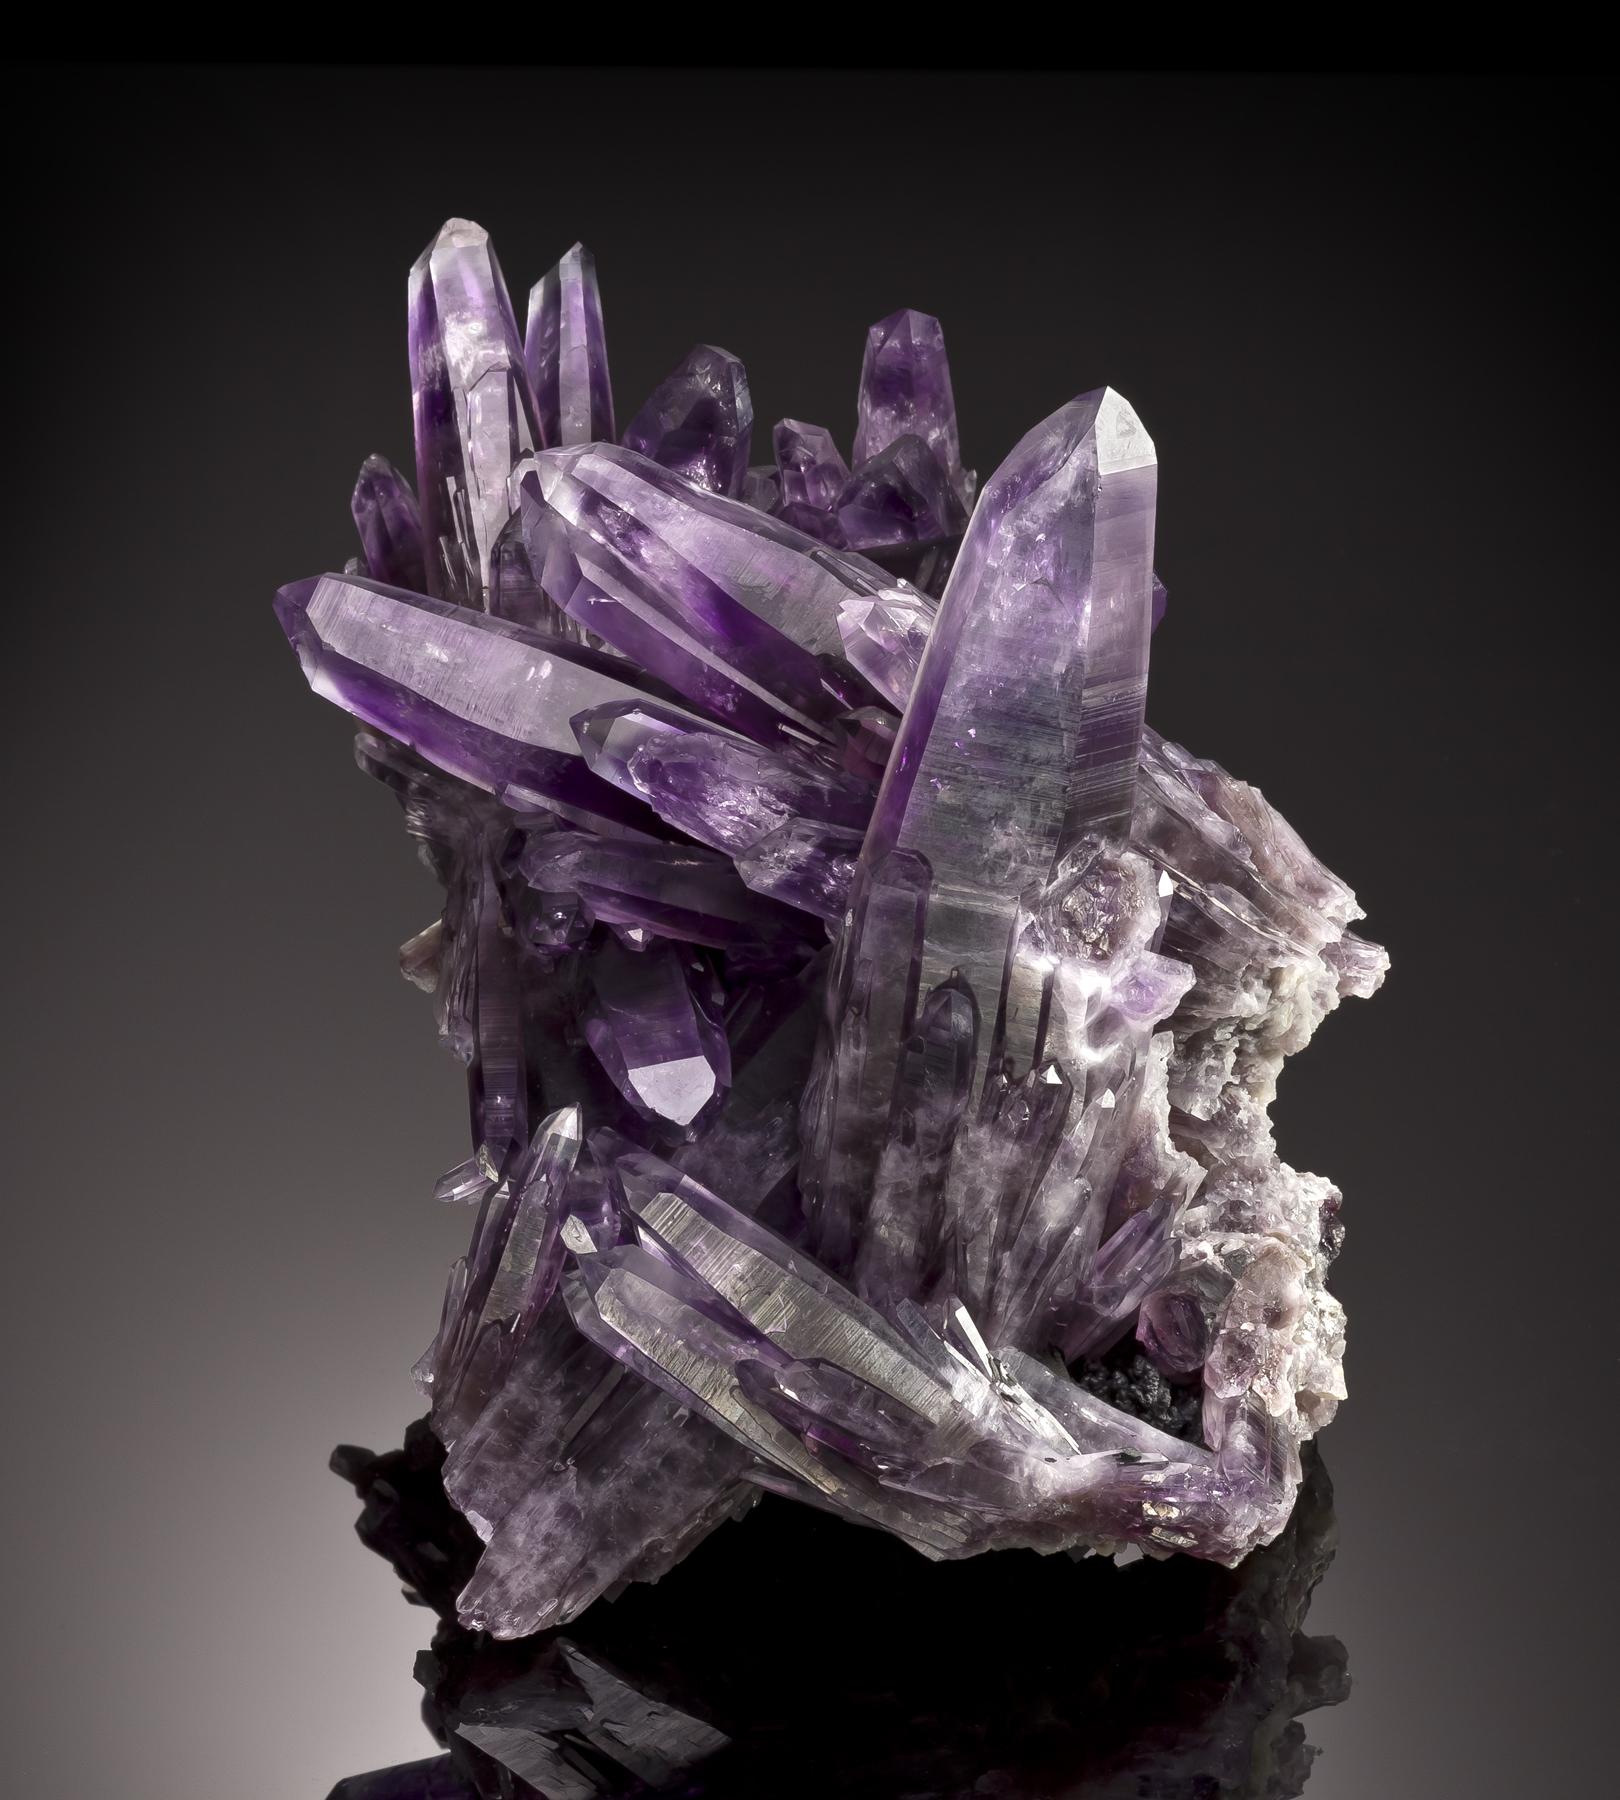 amethyst-guererro-mexico-21cm-jb1034-26